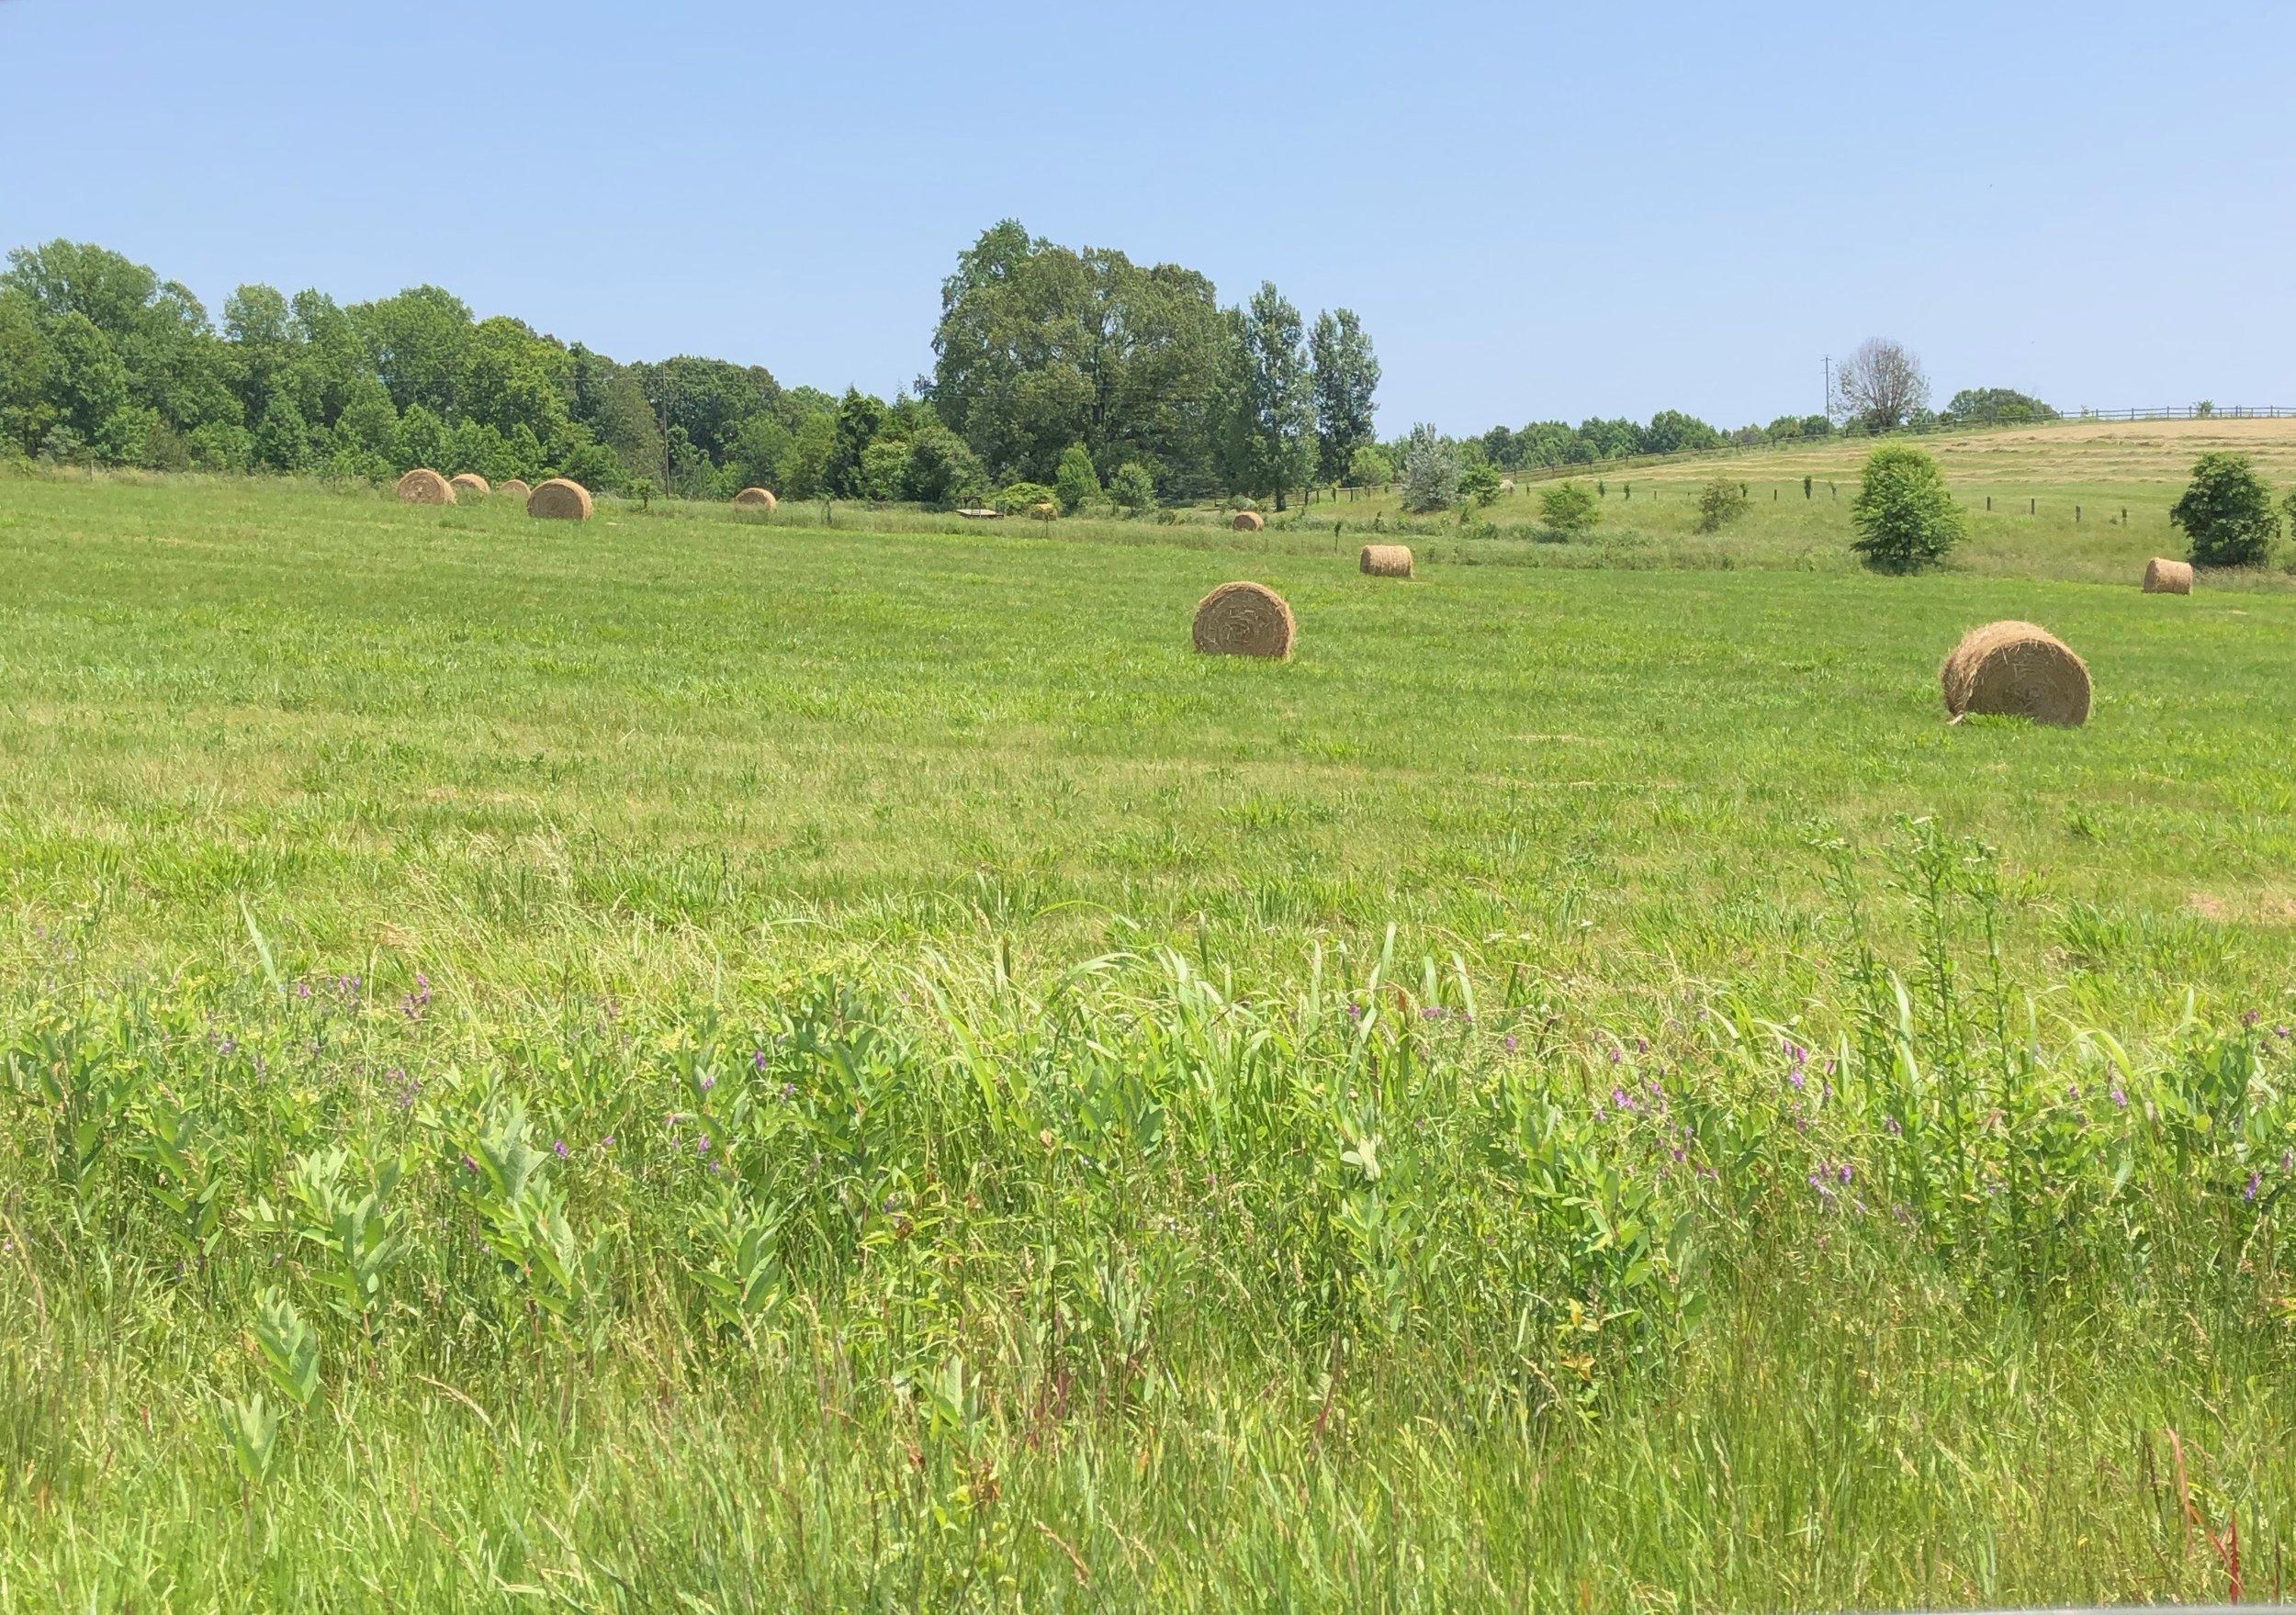 glimsen-farm-hay-1.jpeg